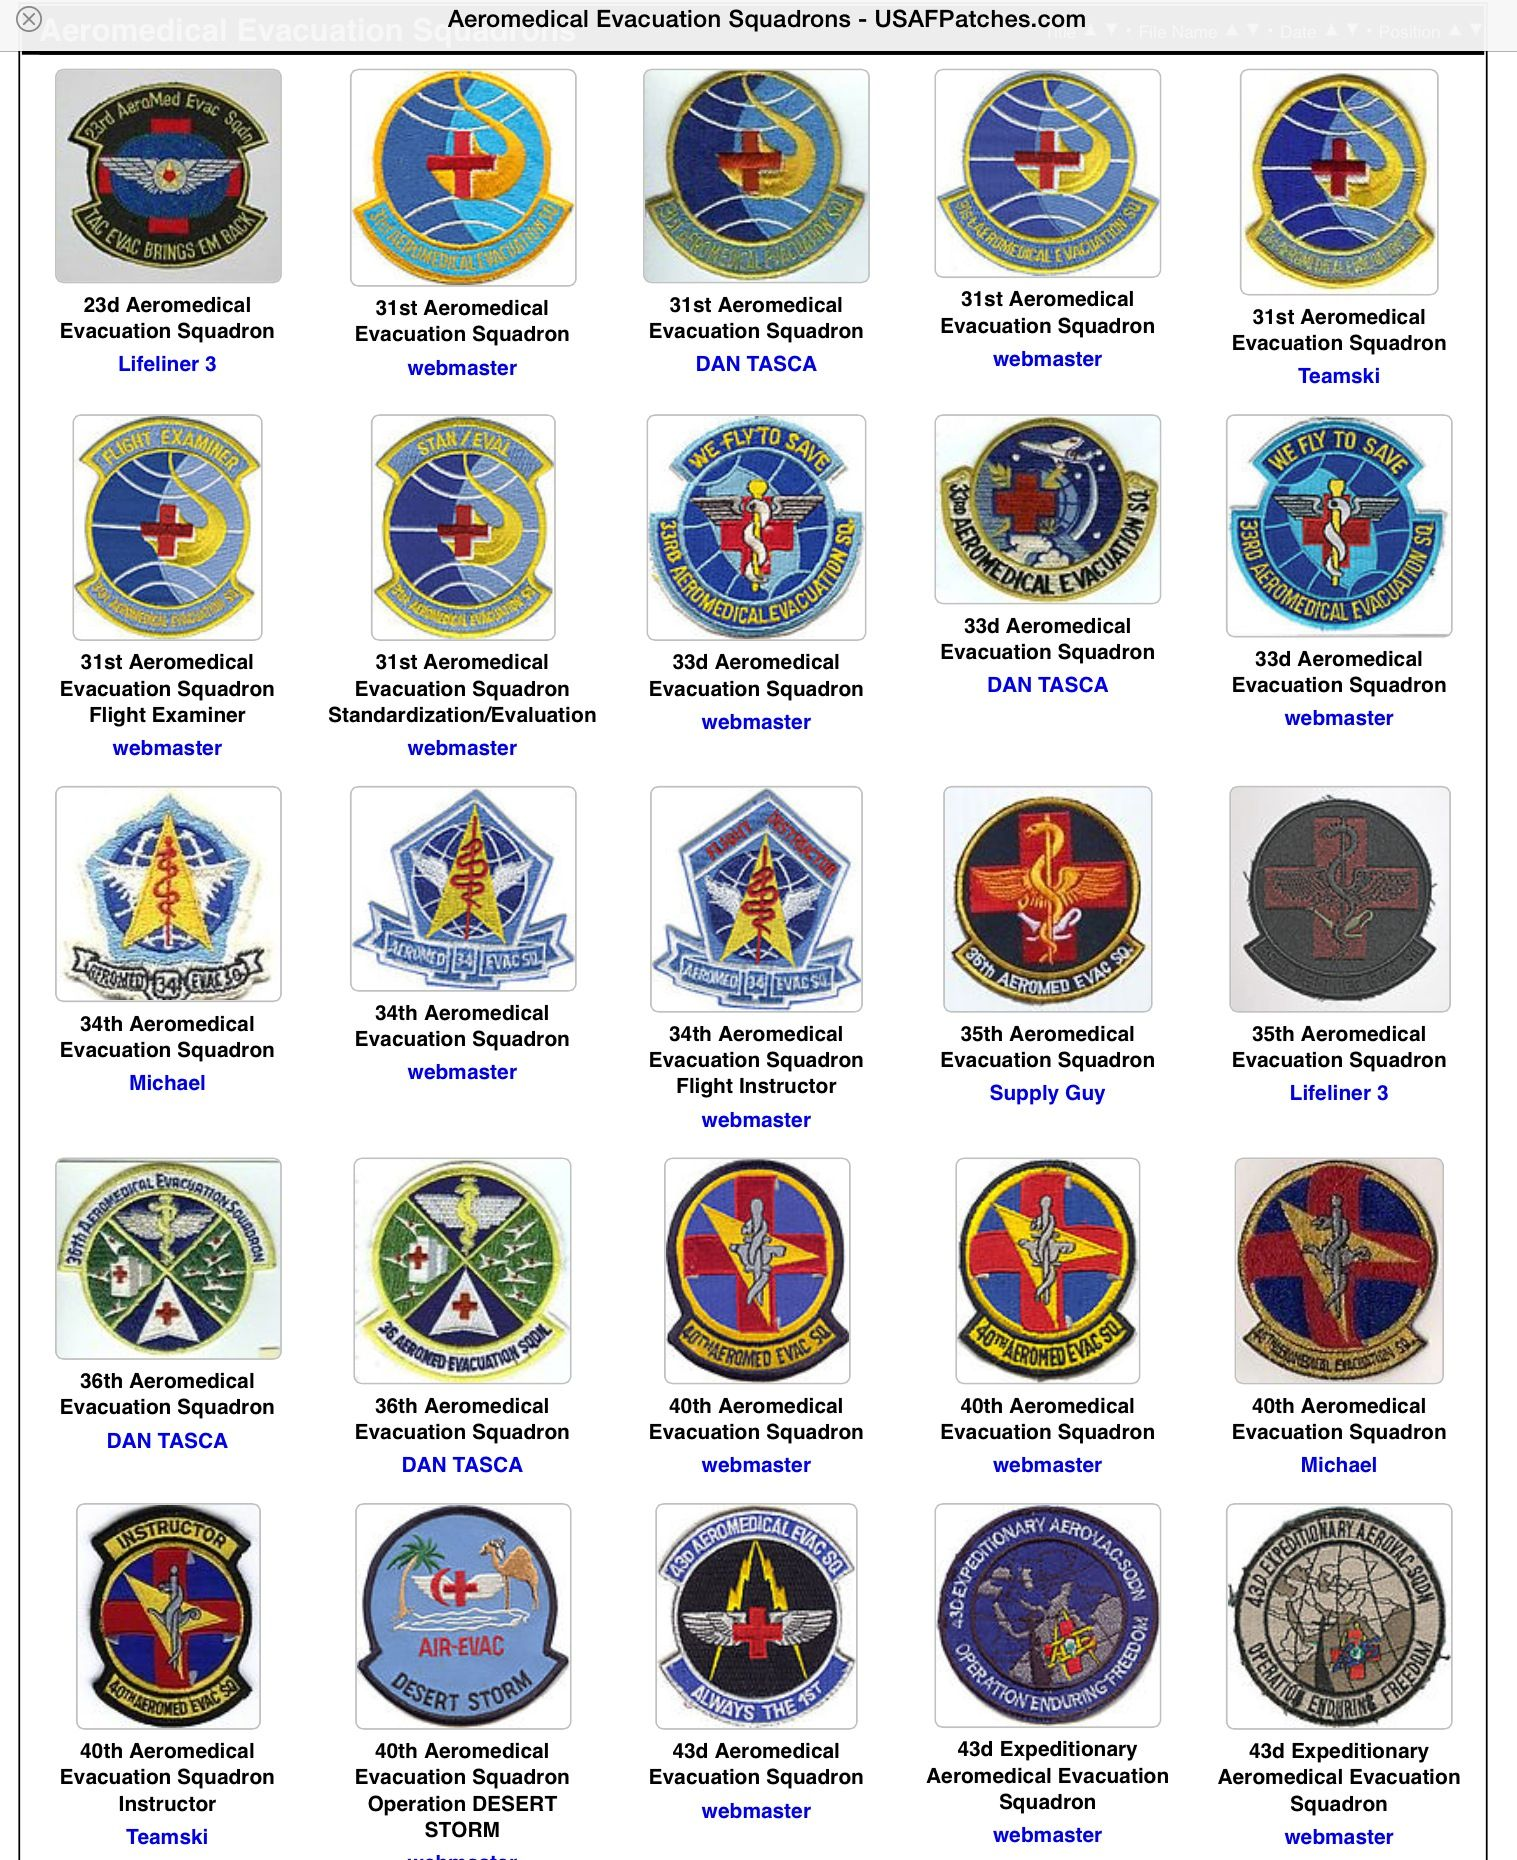 Badges of honor | Ram's Aeromedical Evacuation career | Care